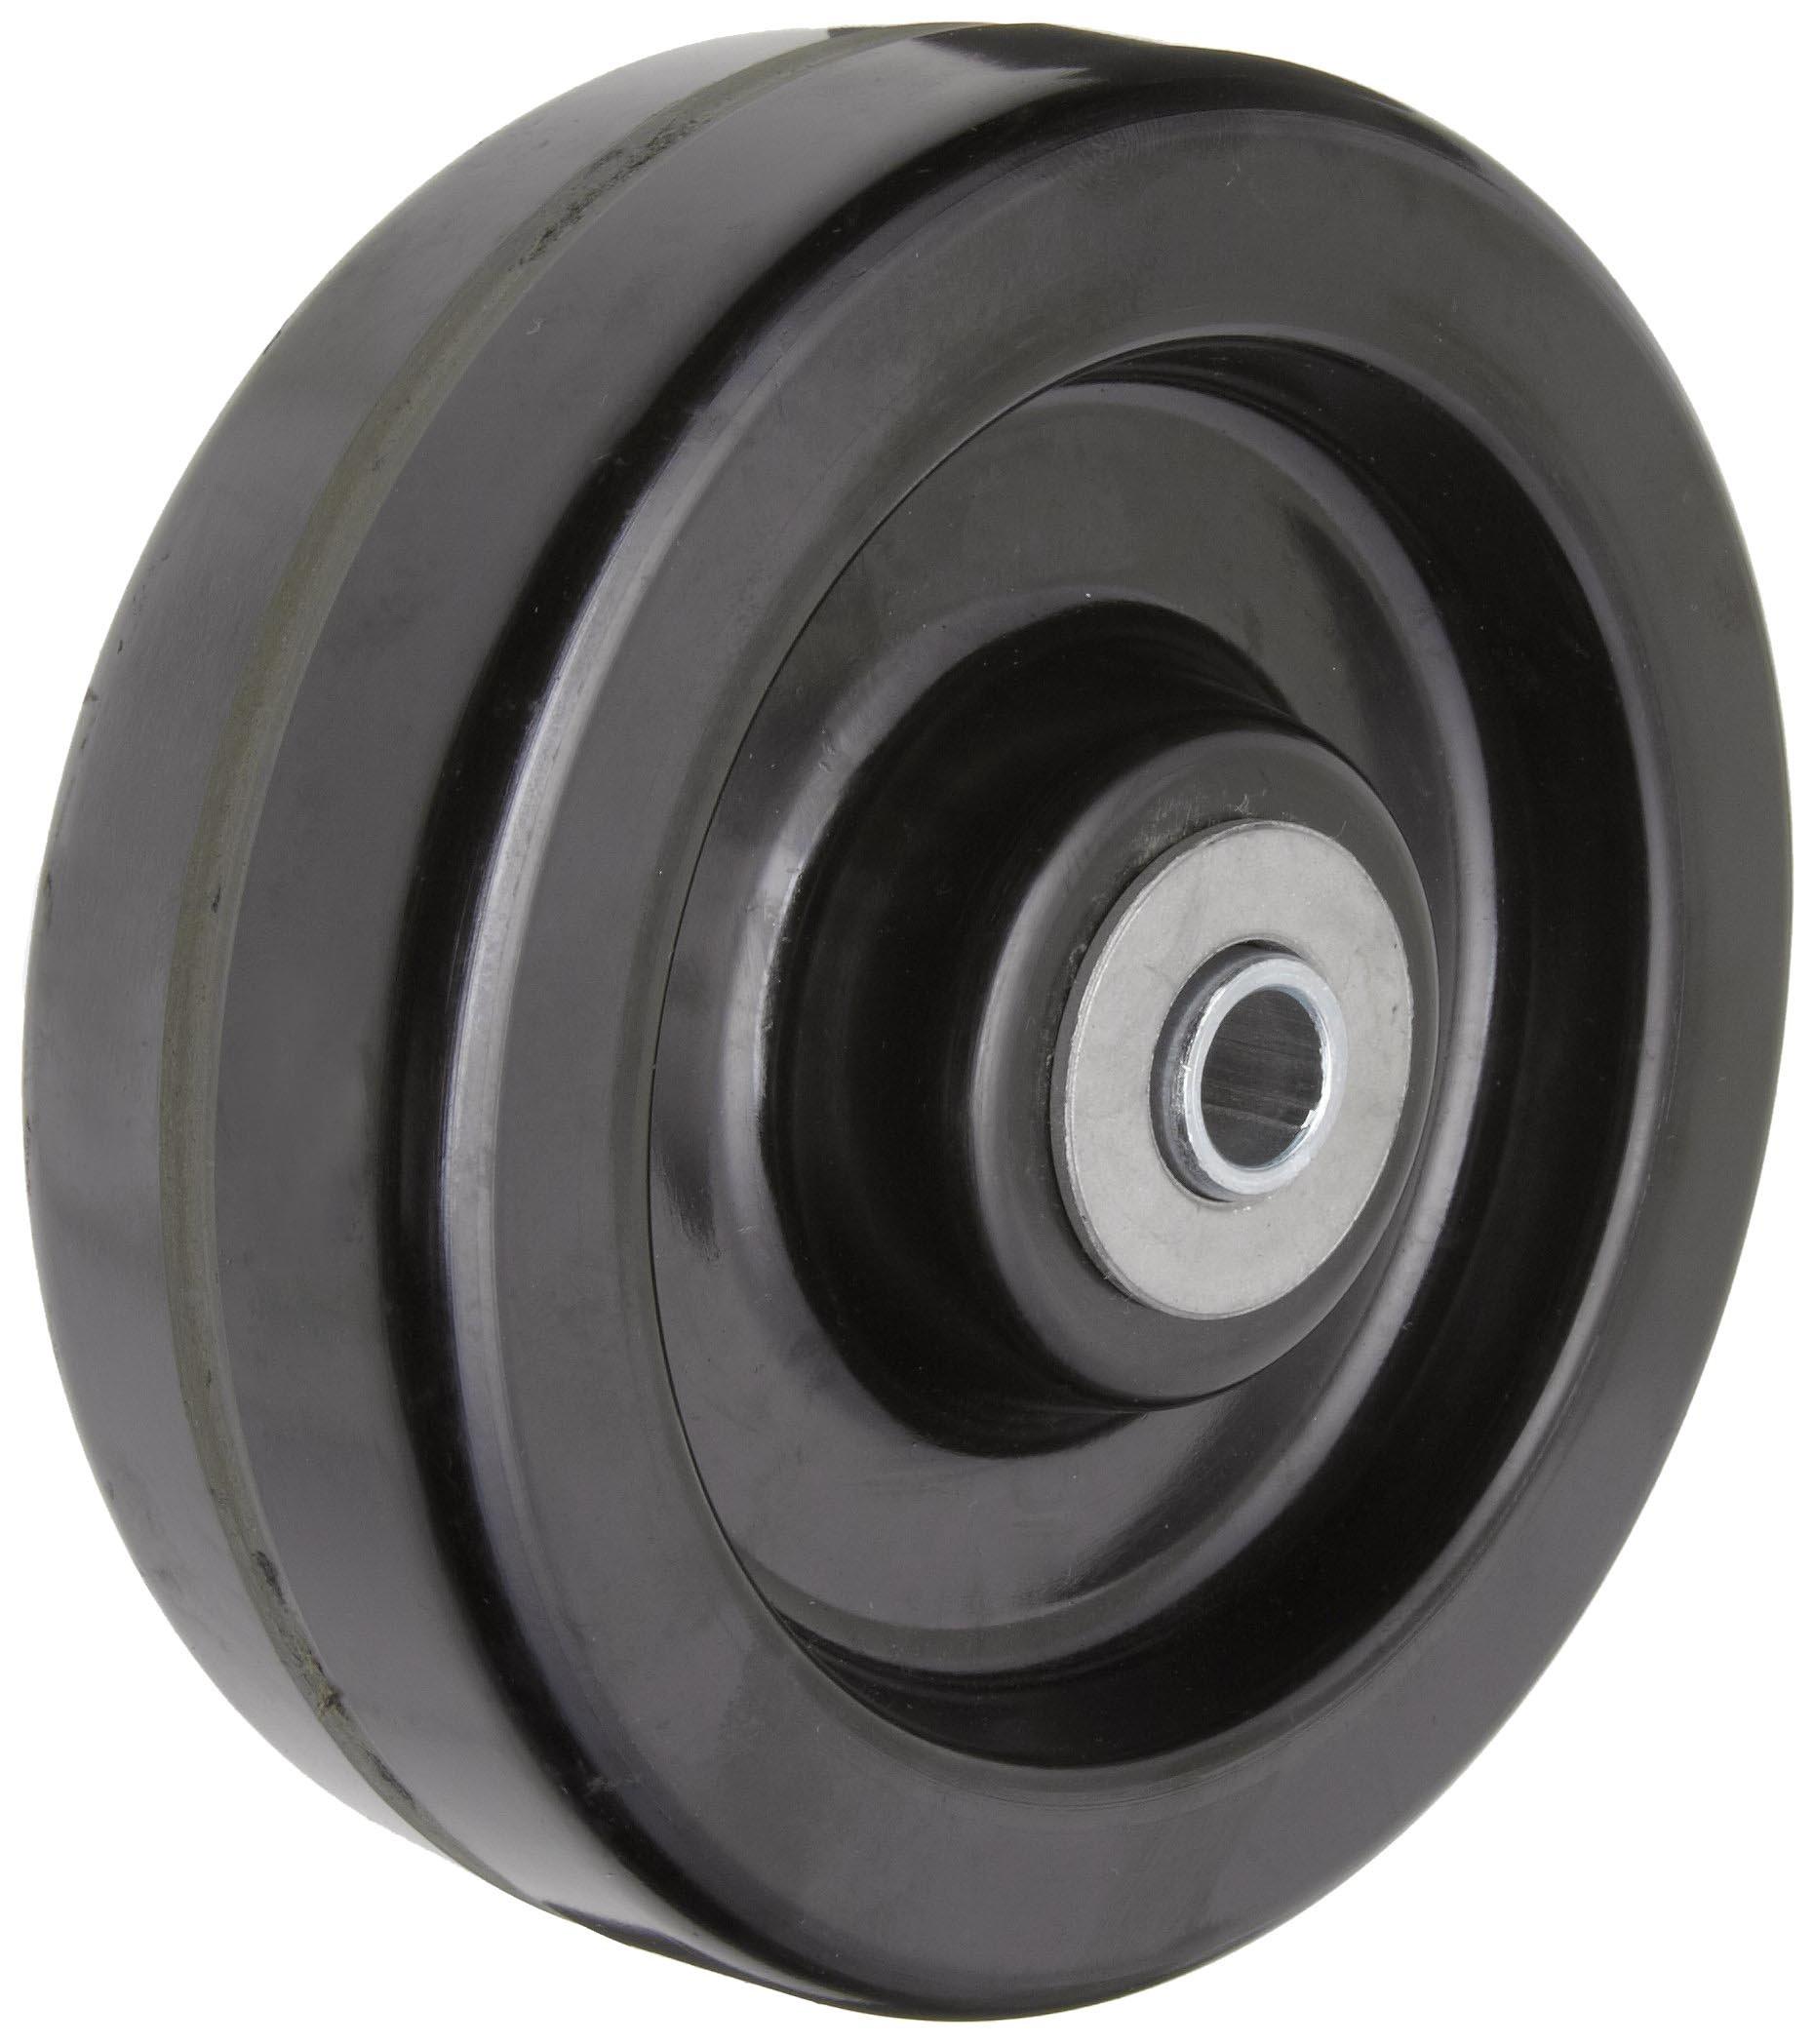 RWM Casters DUR-0620-08 6'' Diameter X 2'' Width Durastan Phenolic Wheel with Straight Roller Bearing, 1200 lbs Capacity, 1/2'' Axle Diameter by RWM Casters